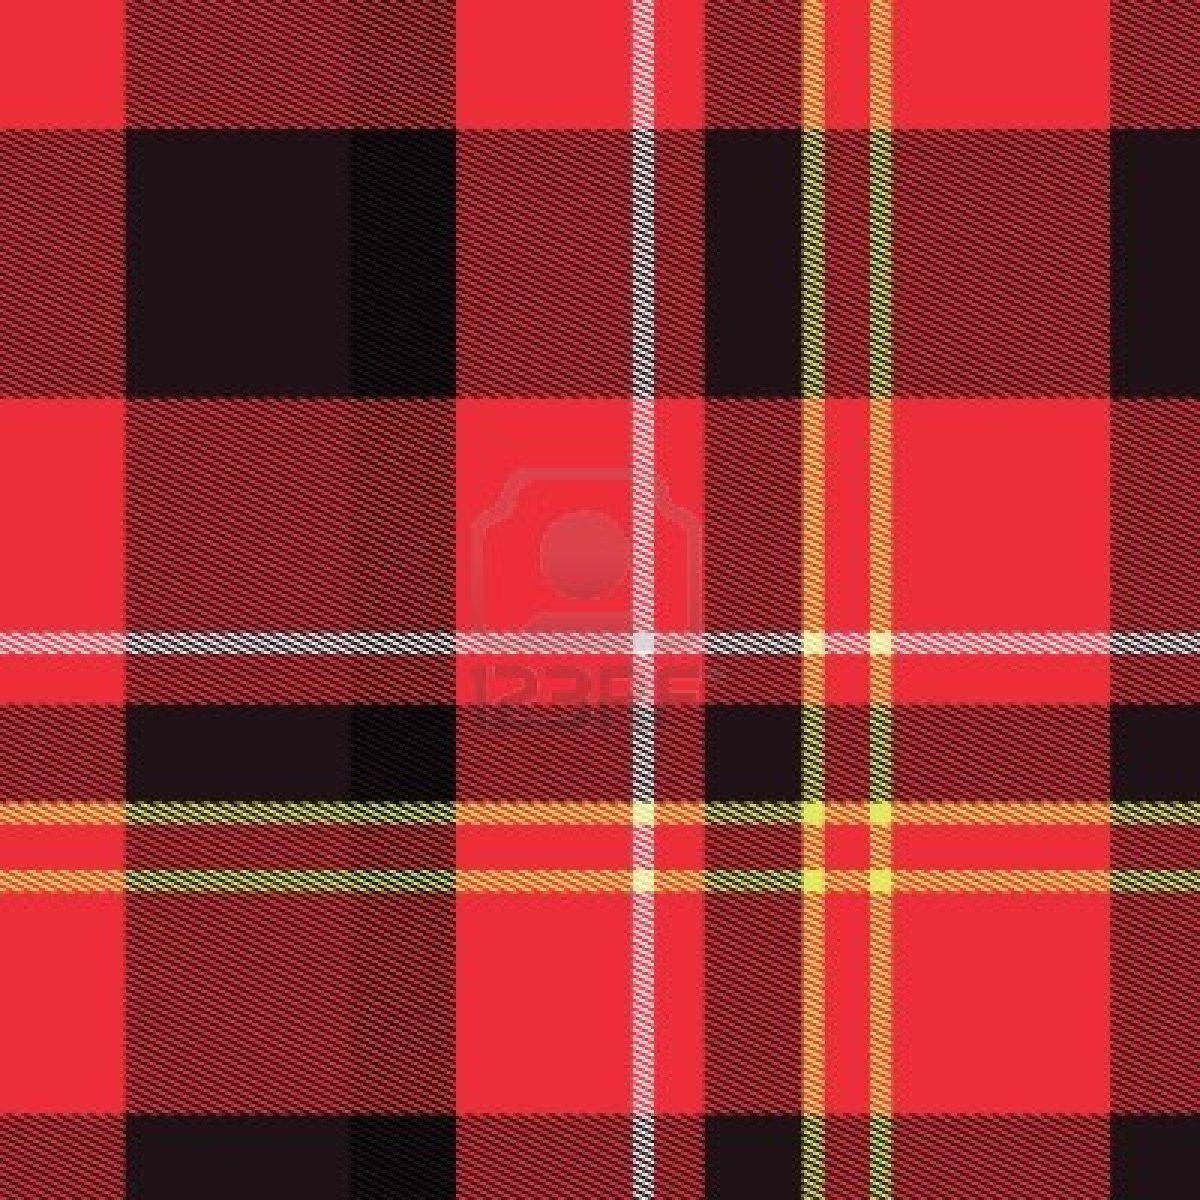 Image Detail For  Tartan Scottish Plaid Material Pattern Texture Design  Royalty Free .